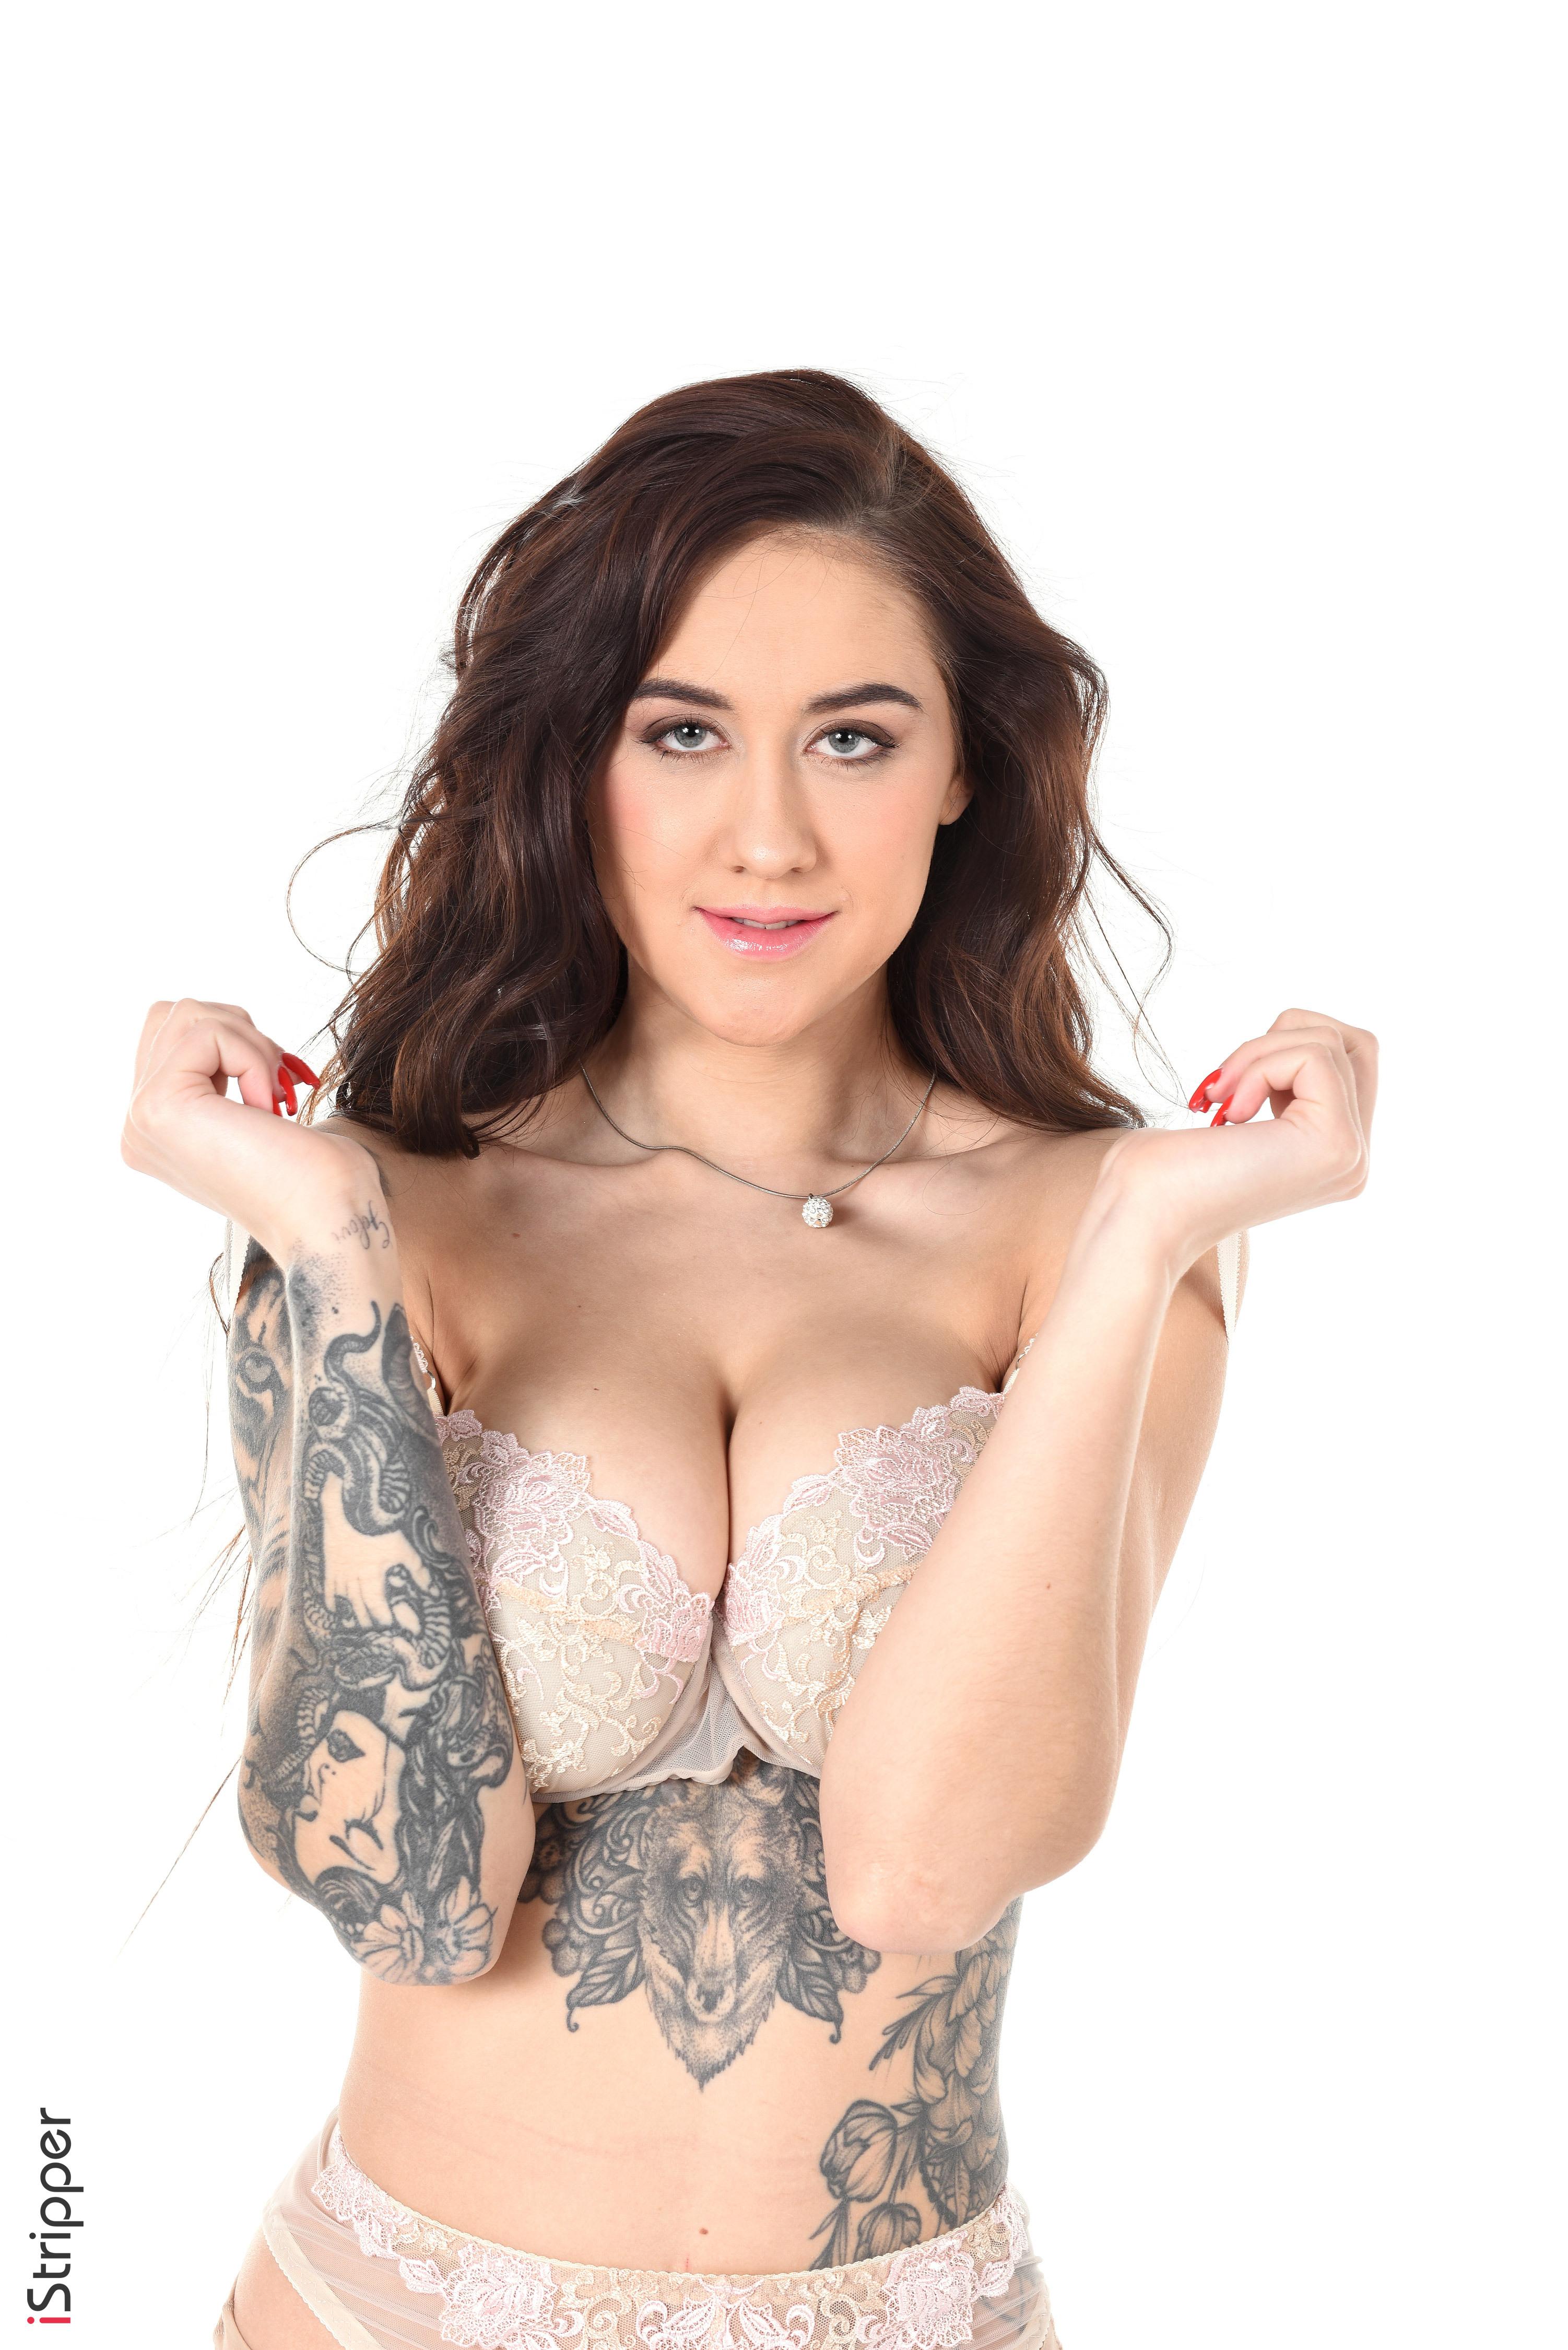 beautiful naked girl wallpaper